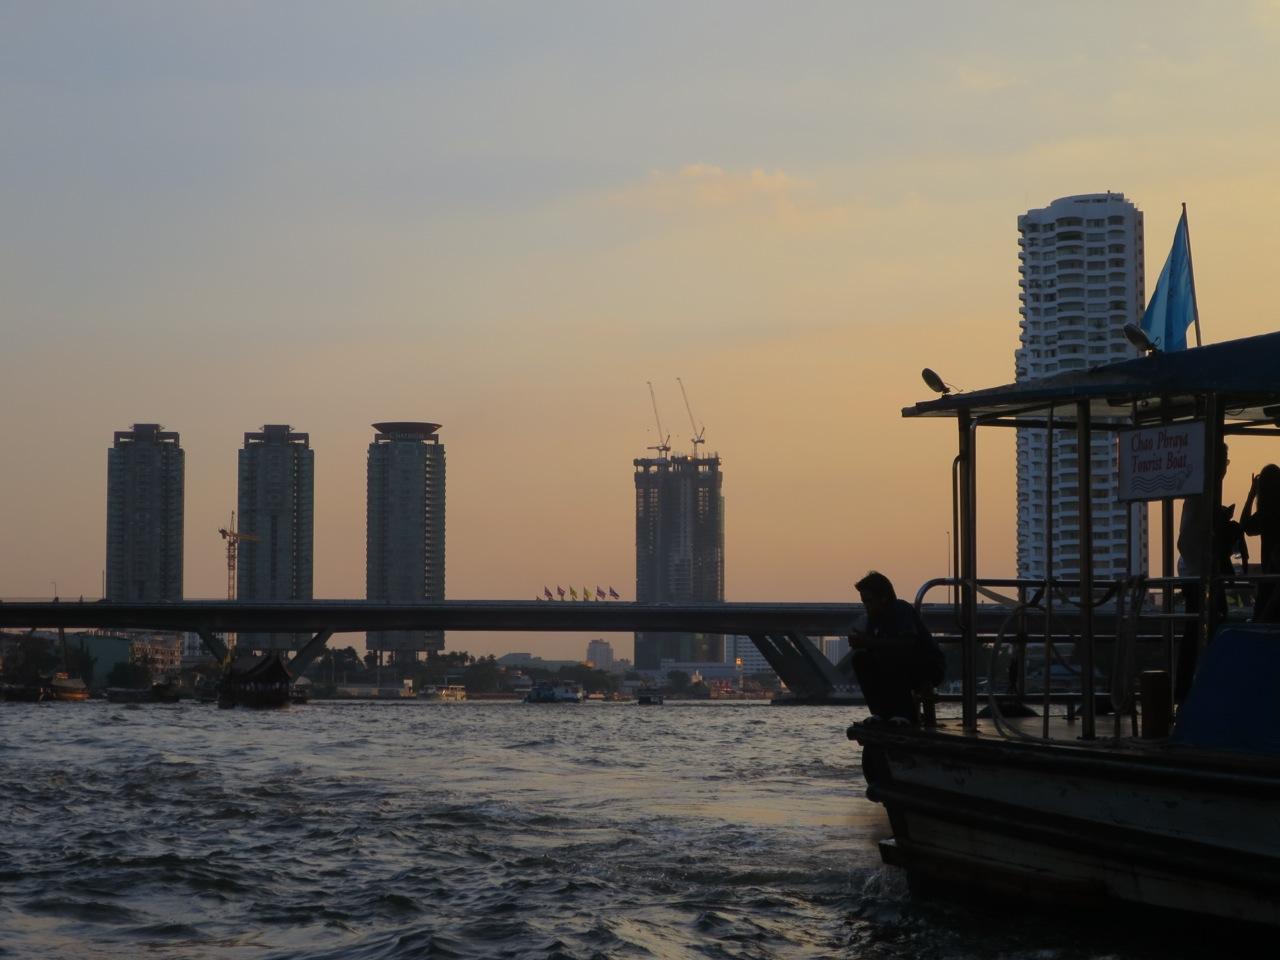 Bangkok 2-27